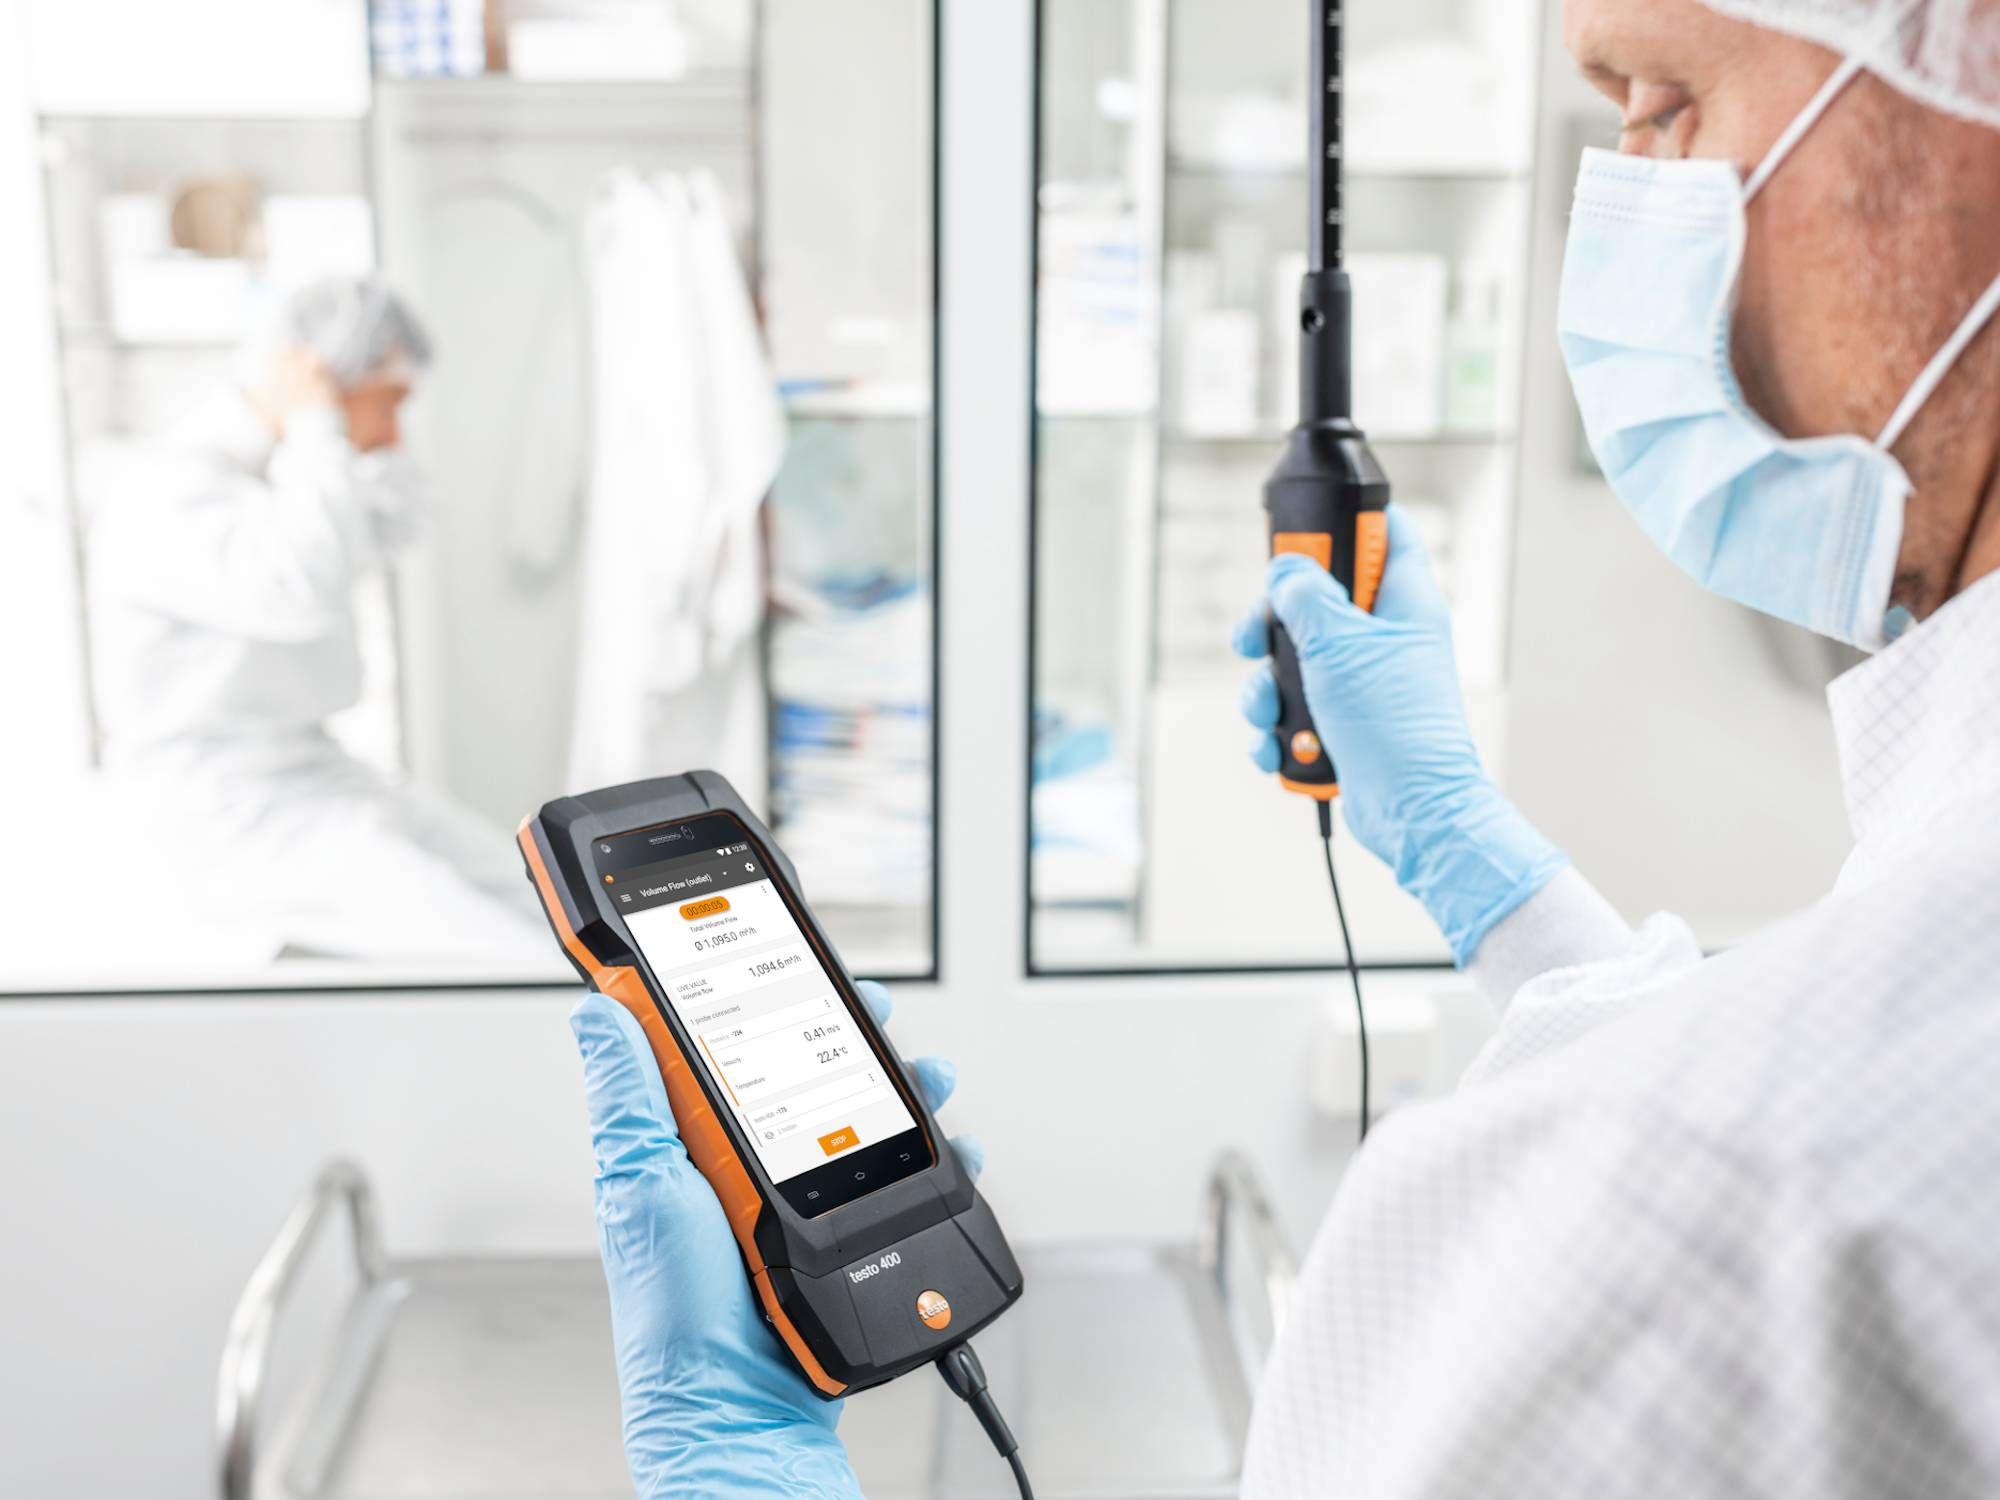 testo 400智能型参比级环境测量仪搭配高精度温湿度探头